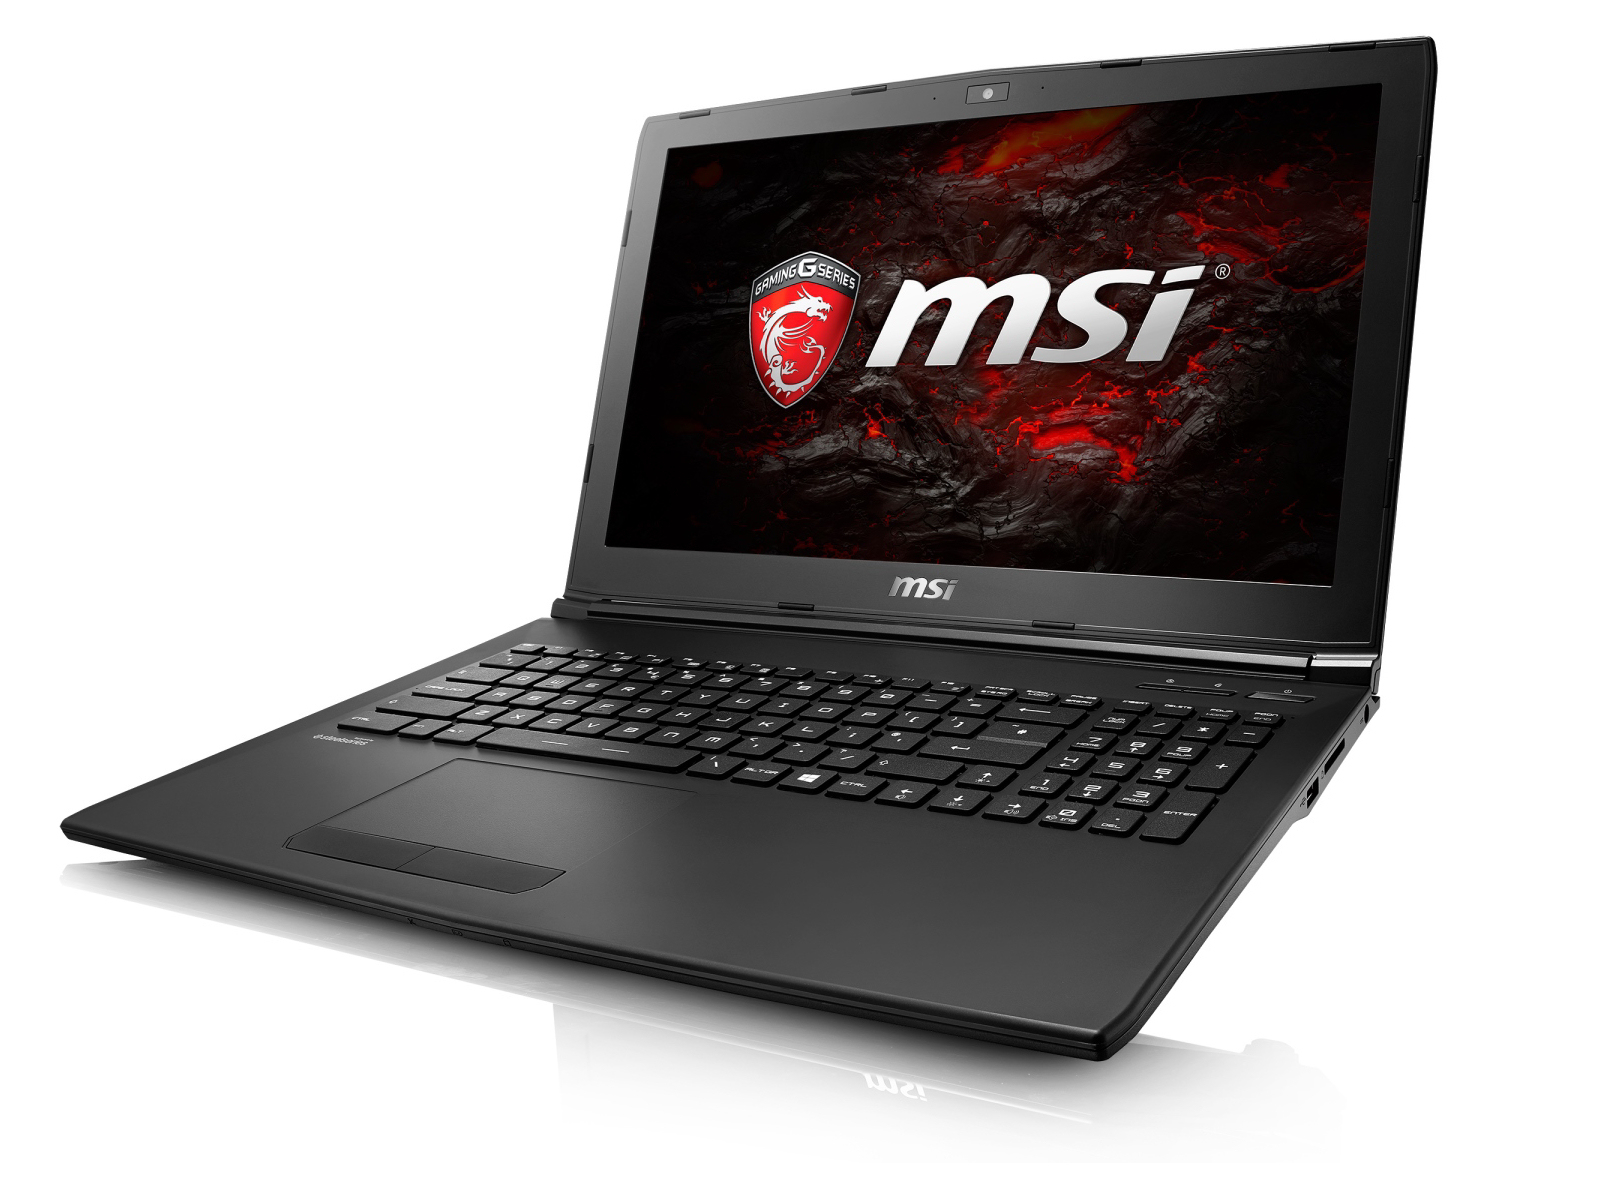 ddd504214 MSI GL62M 7RD-077 Notebook Review - NotebookCheck.net Reviews